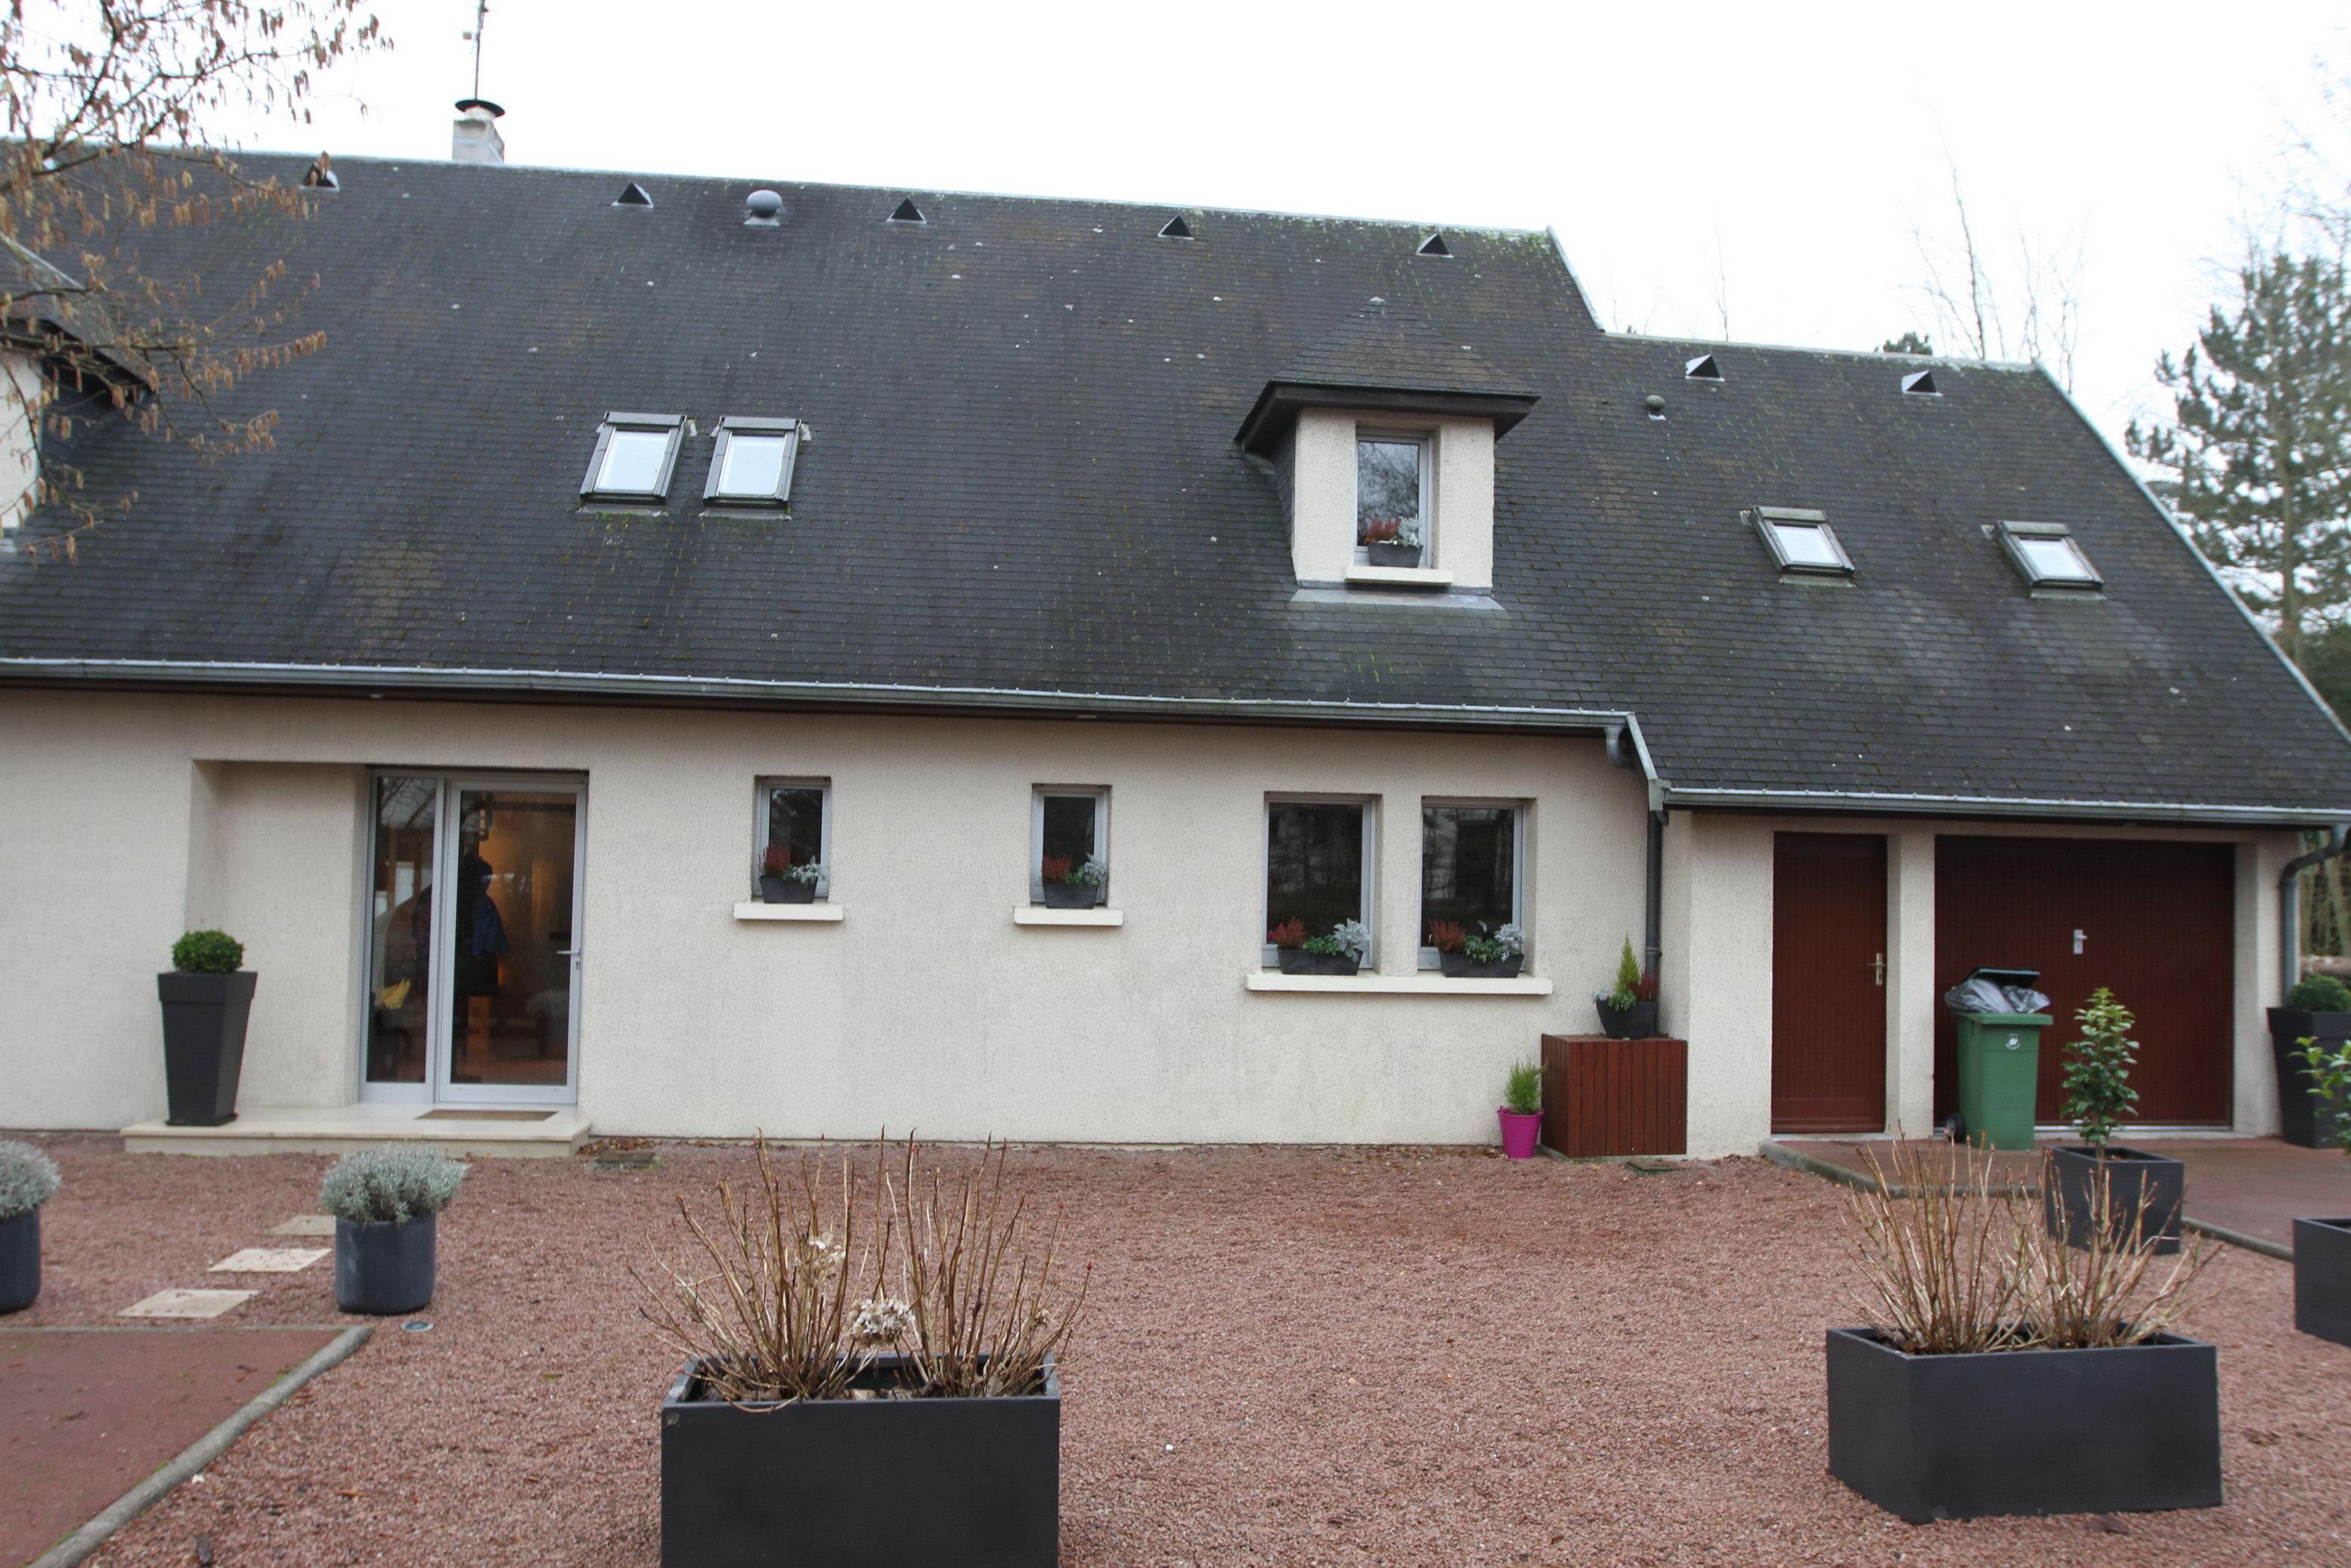 renovation exterieure maison annee 80 ventana blog. Black Bedroom Furniture Sets. Home Design Ideas